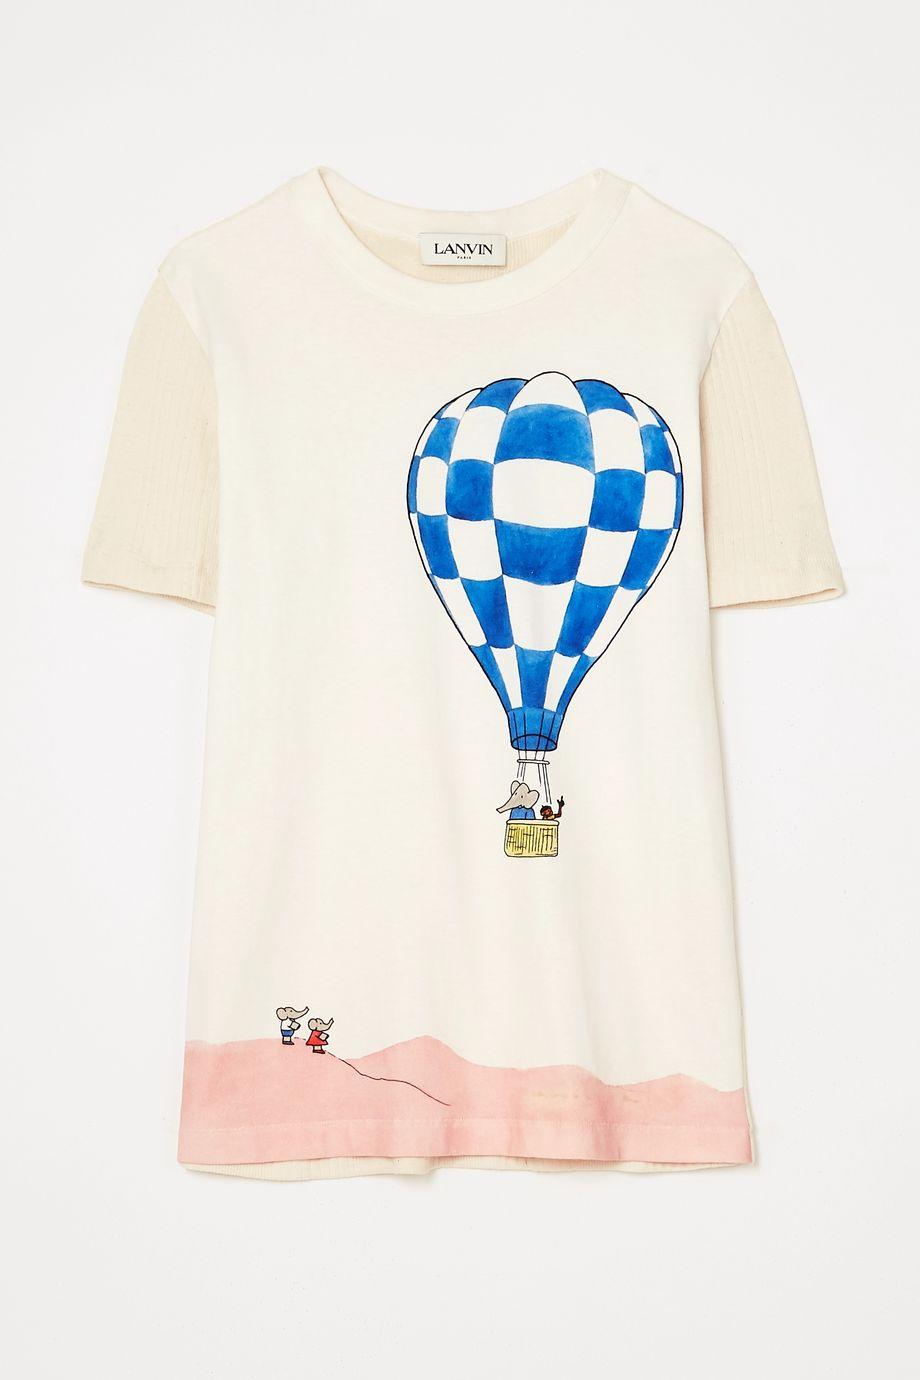 Lanvin Paneled printed cotton-jersey T-shirt